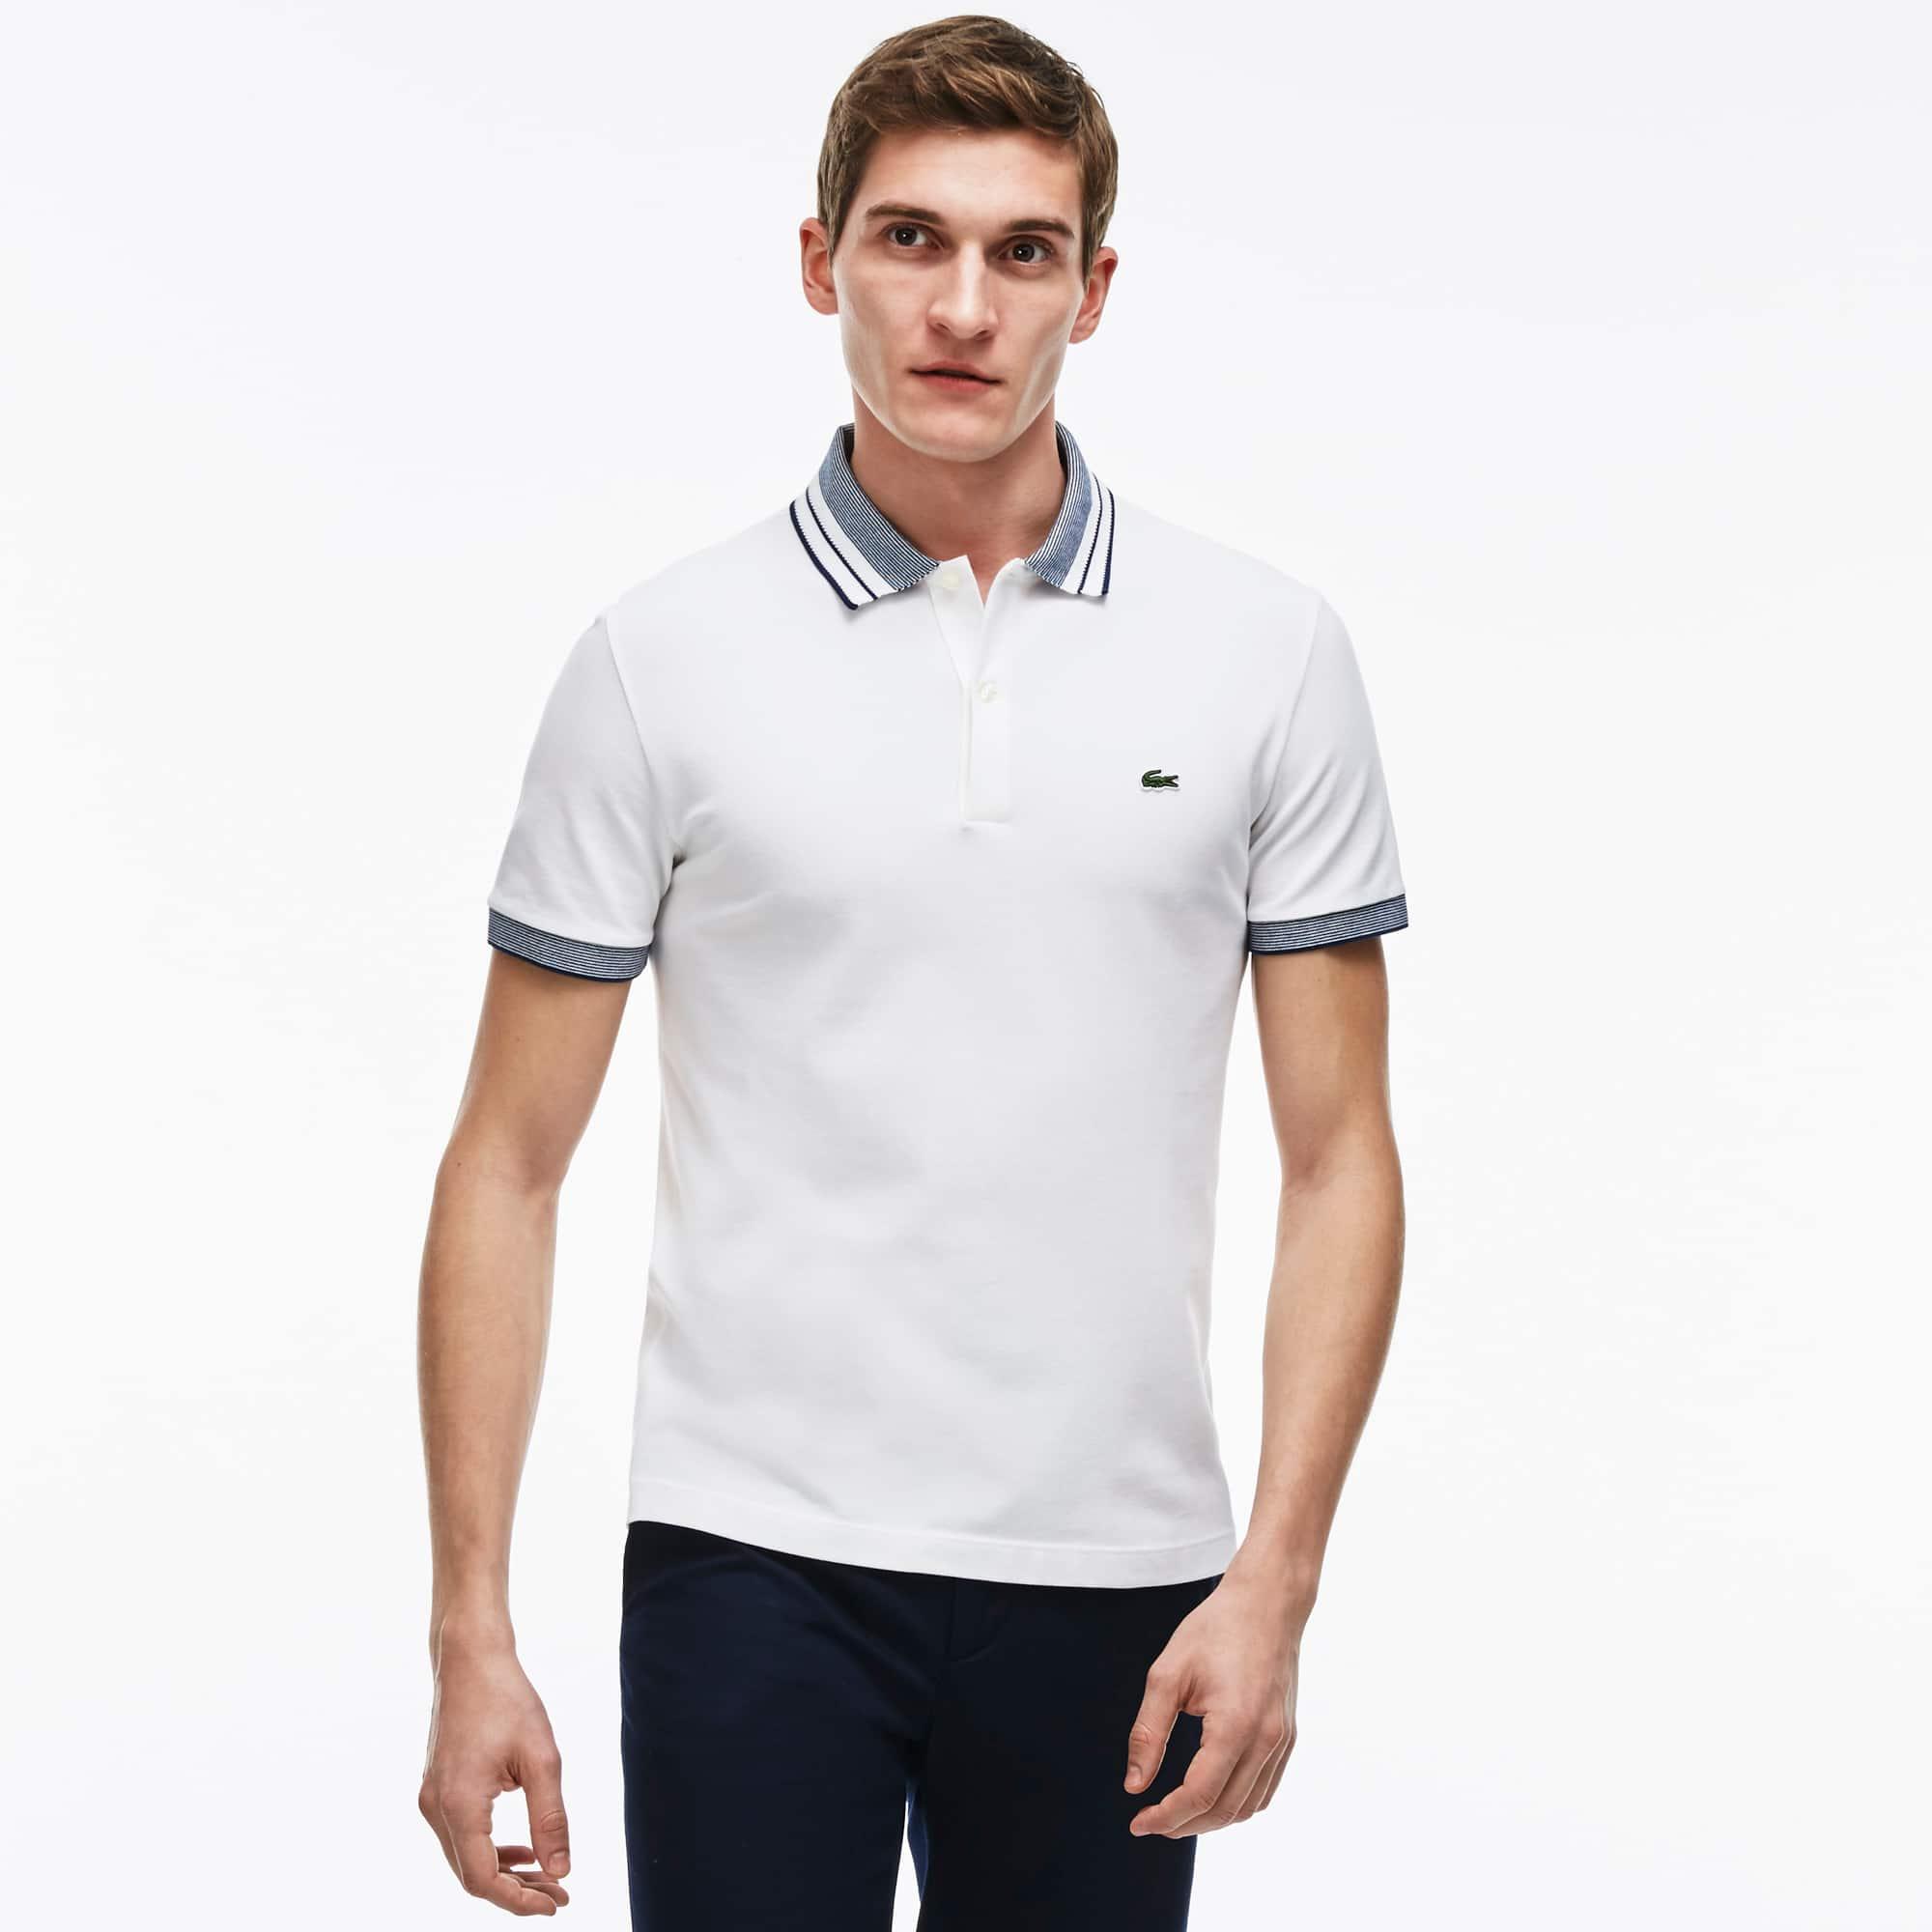 Men's Fine Striped Cotton Rib Polo Shirt